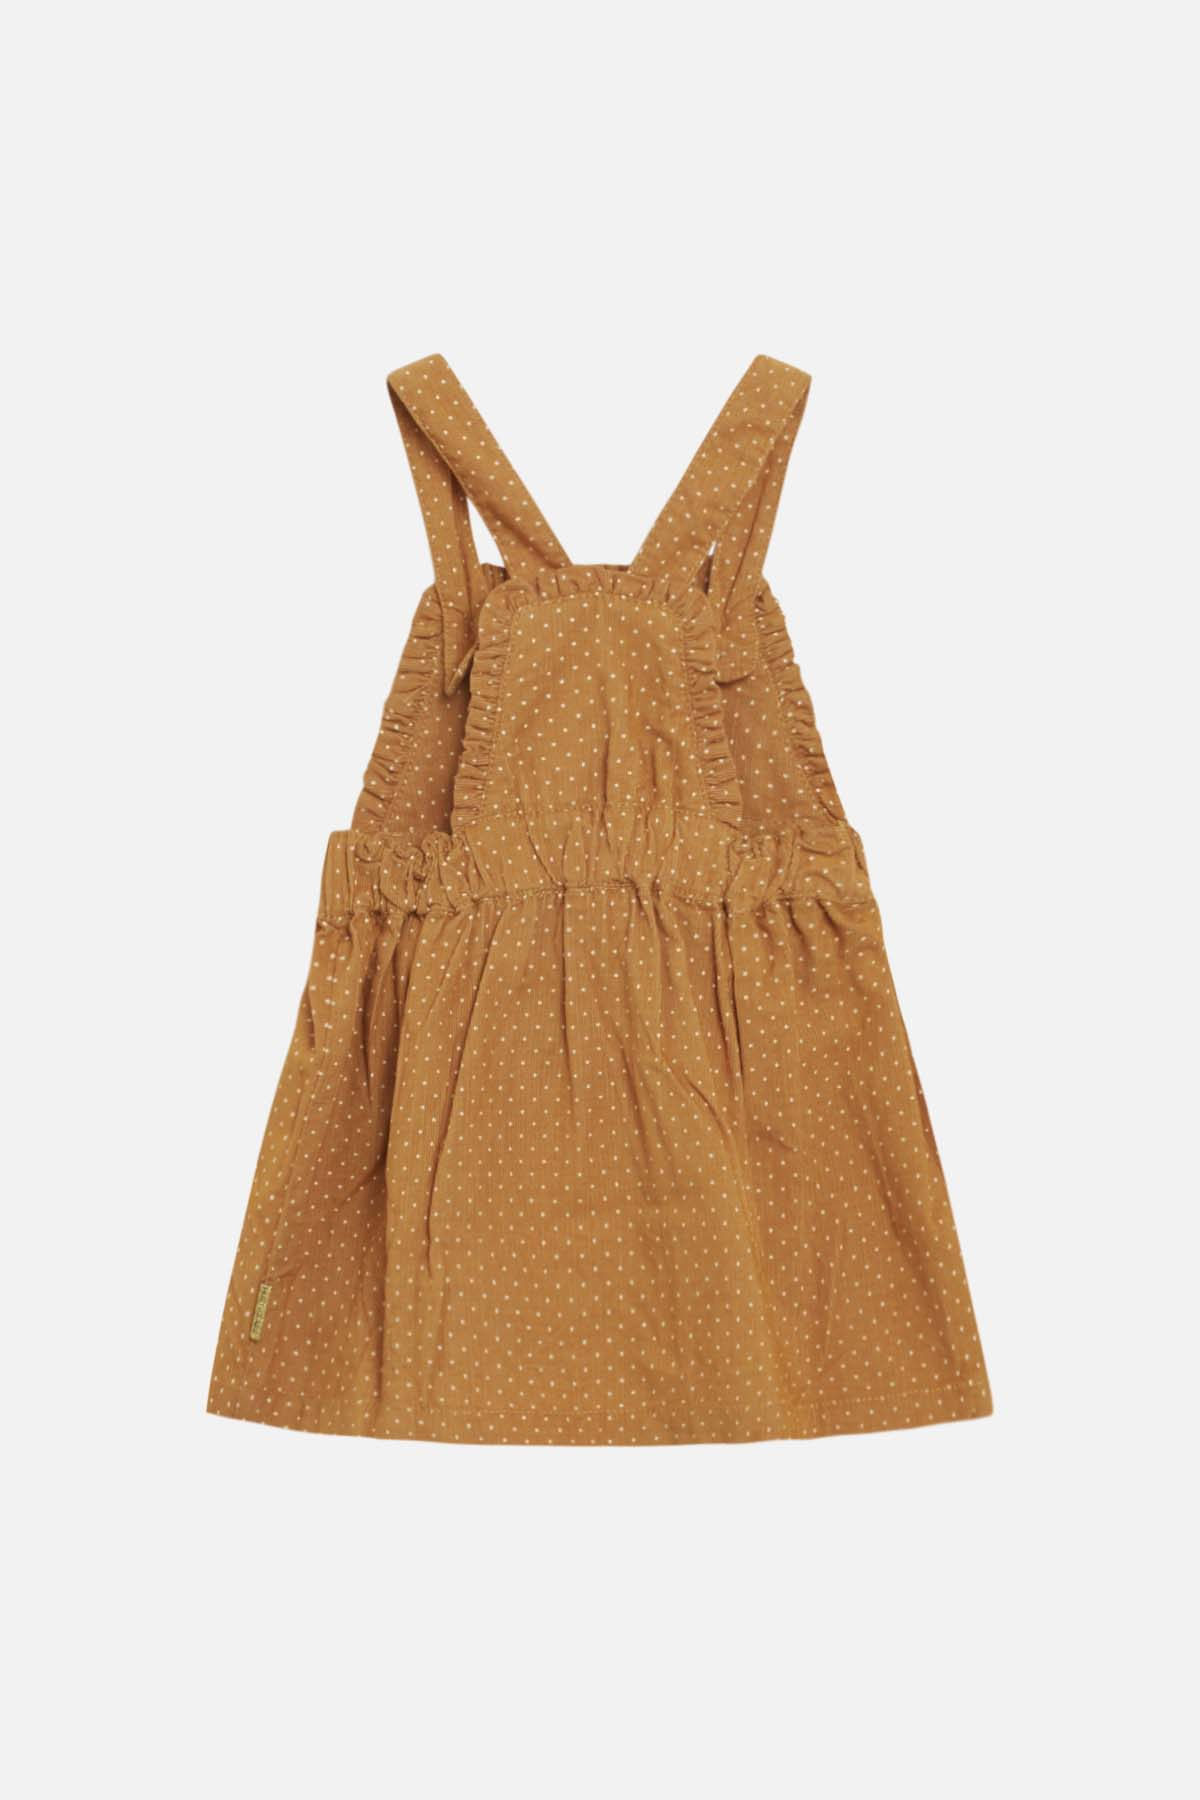 Hust & Claire Kalla kjole, cinnamon, 68